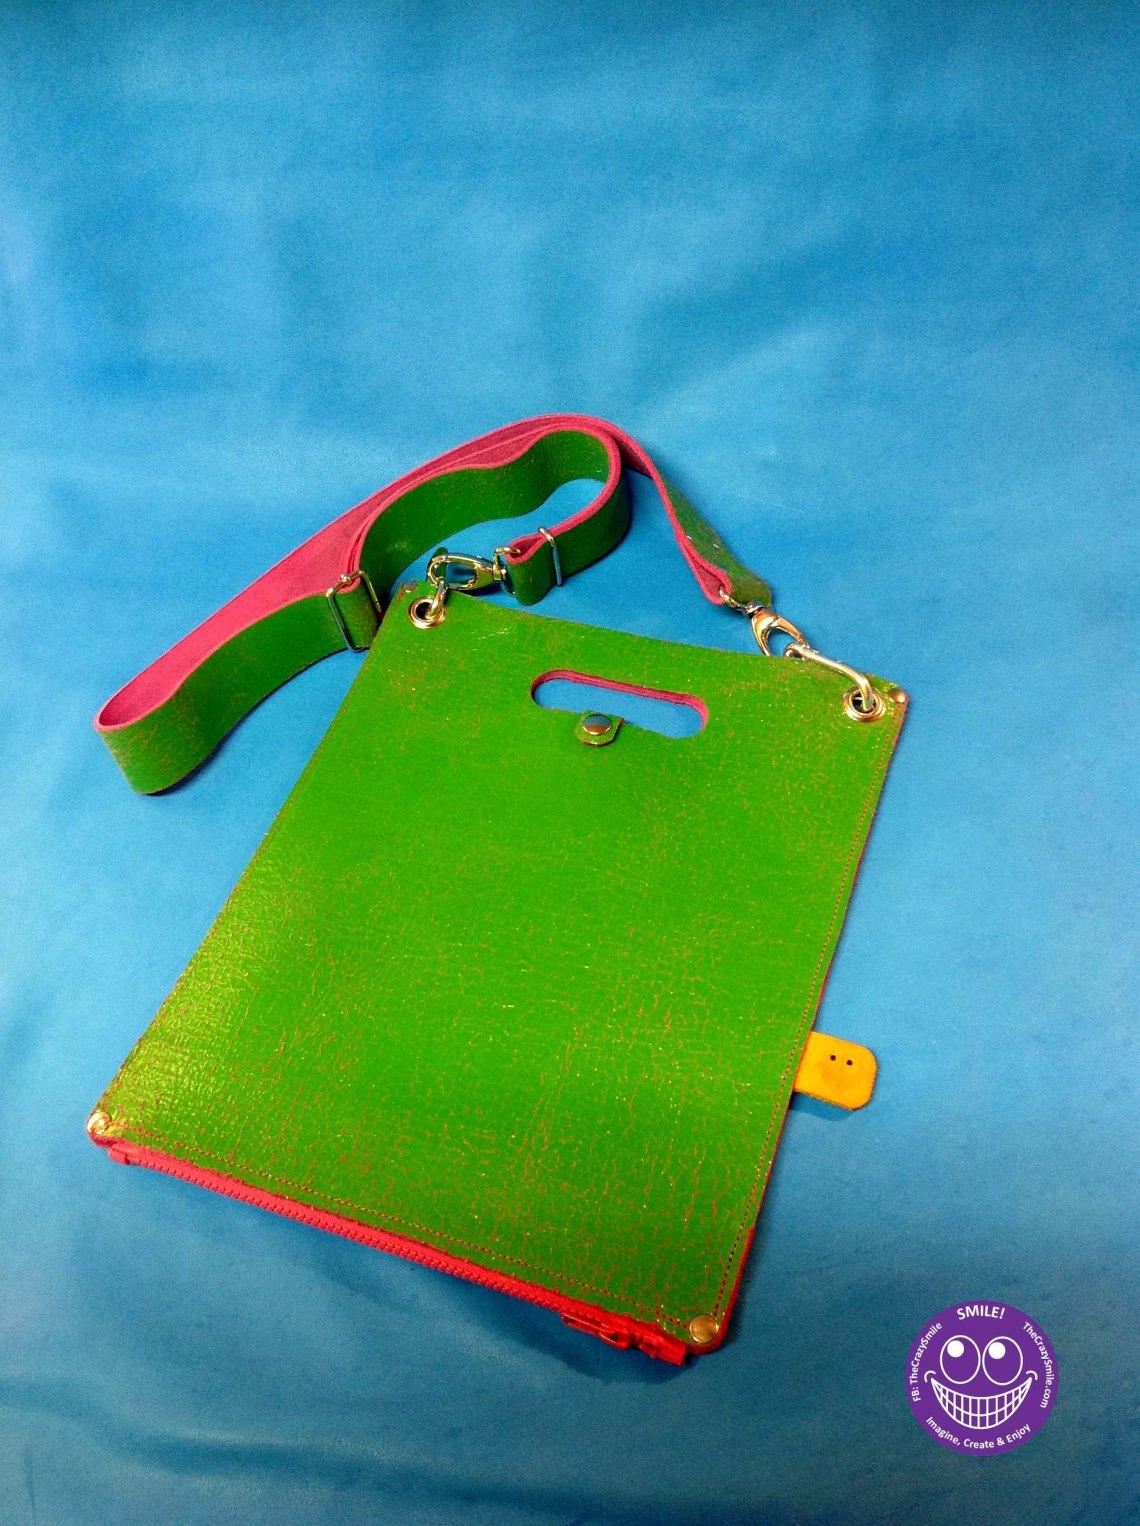 Leater Plastic Bag Disco zipper closed